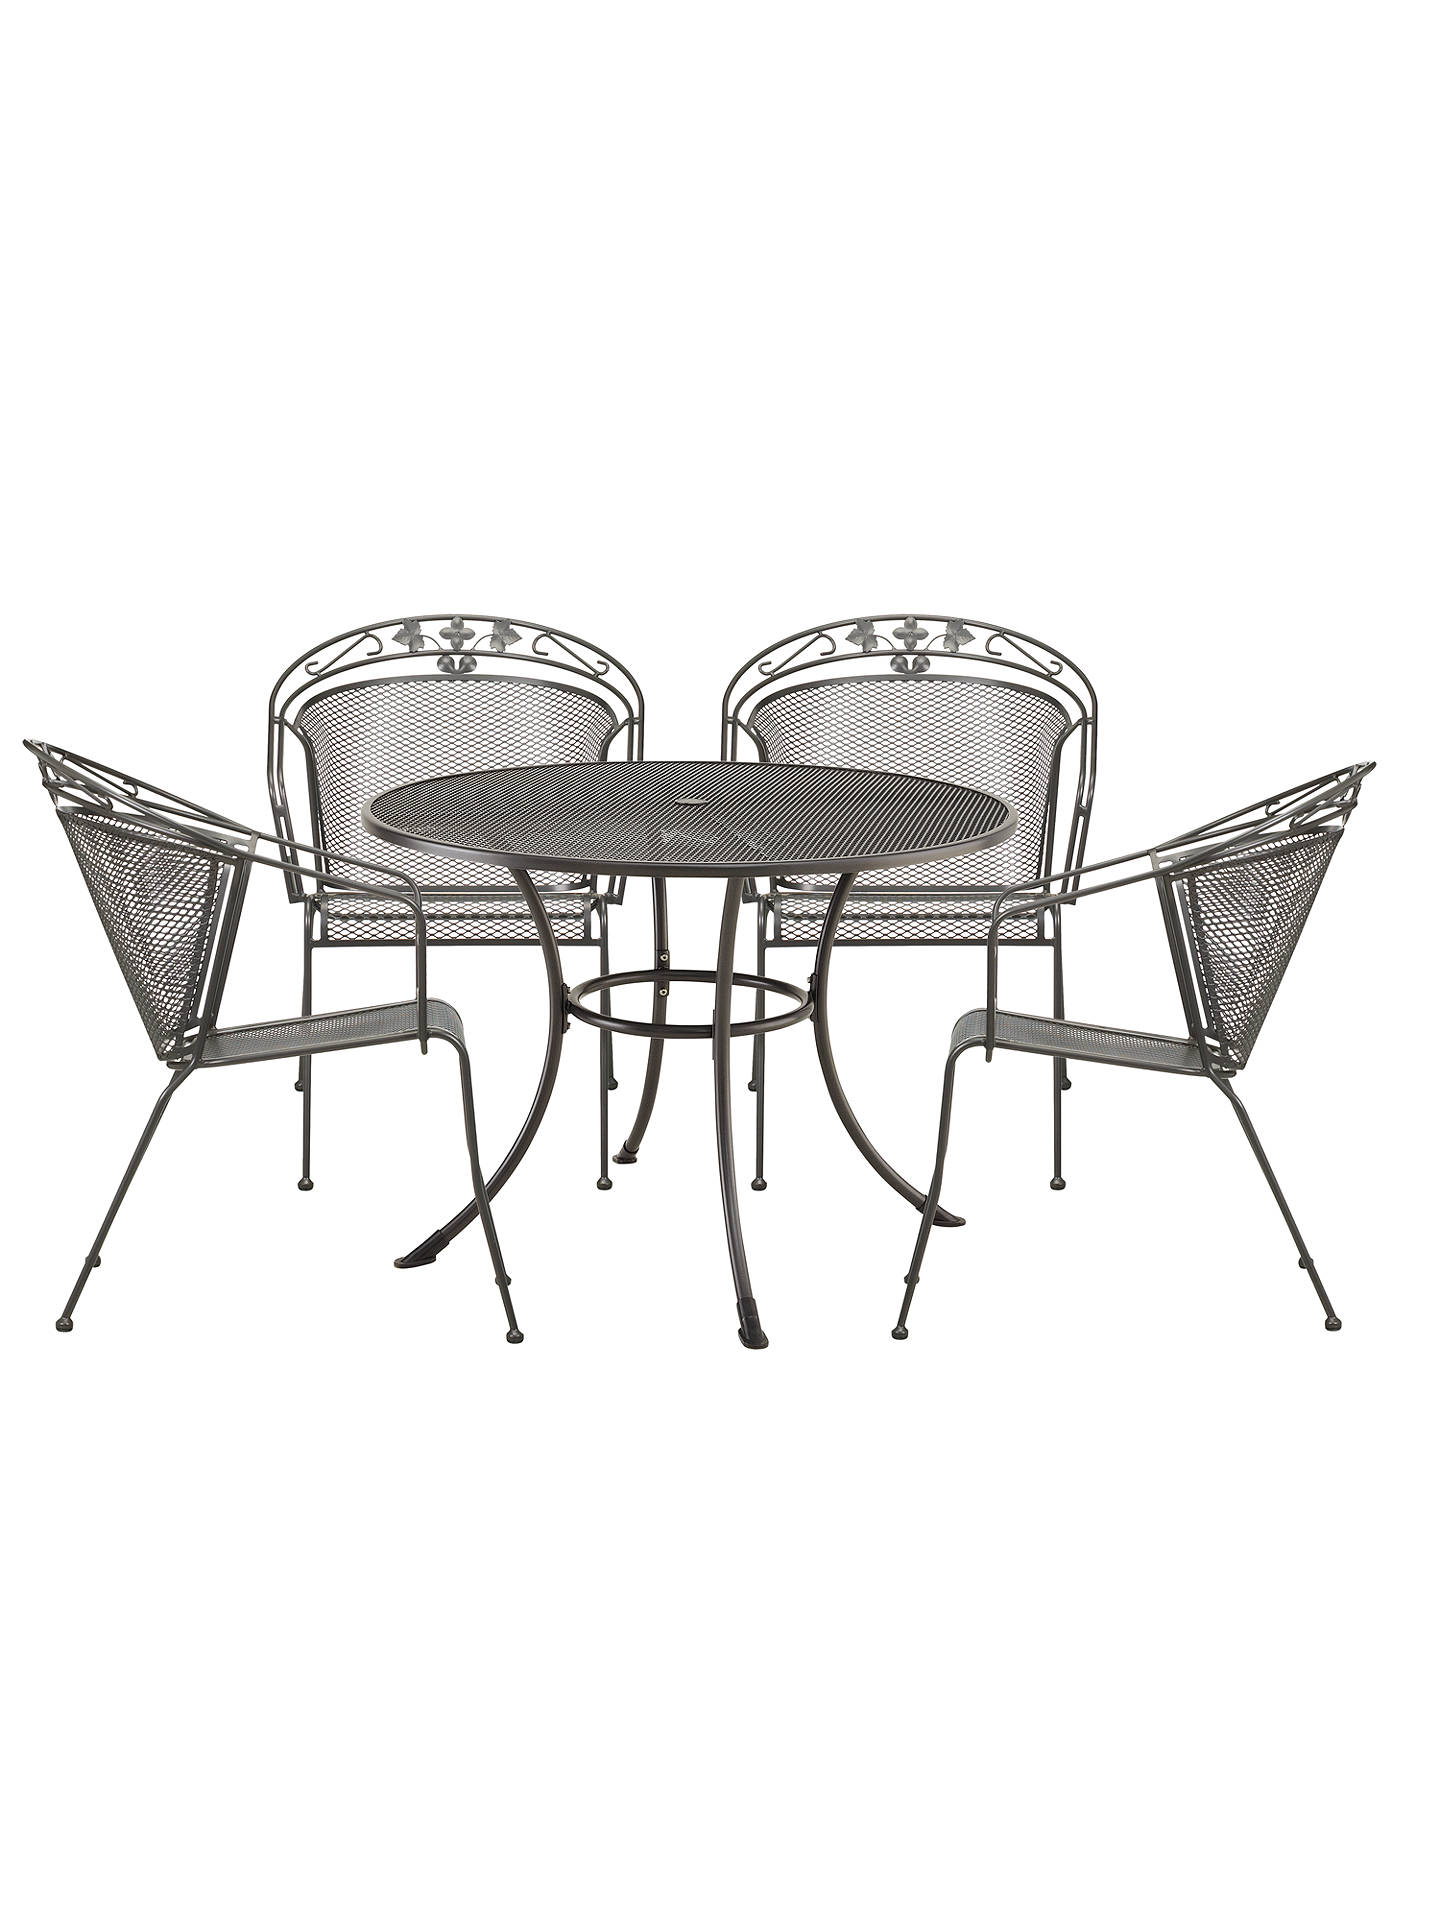 521f1c33a46 Buy John Lewis Henley by KETTLER 4 Seater Round Garden Dining Set Online at  johnlewis.